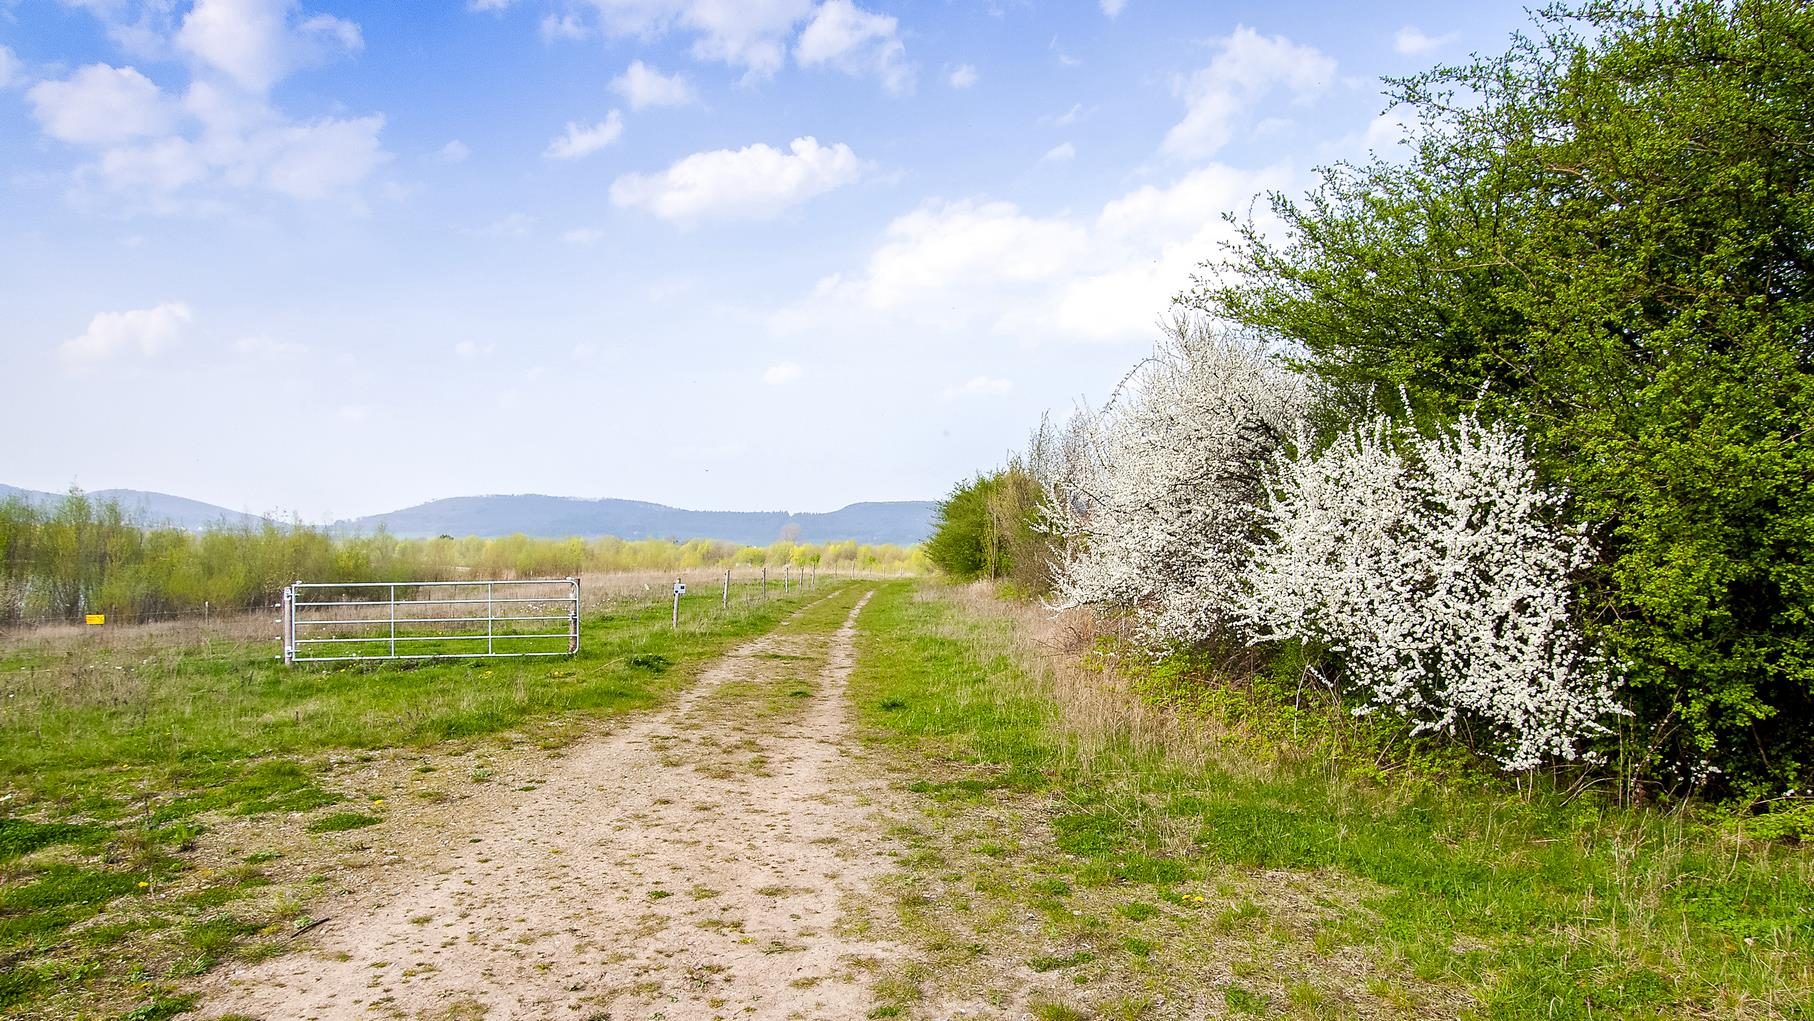 Am Rundweg blühen und grünen Bäume.